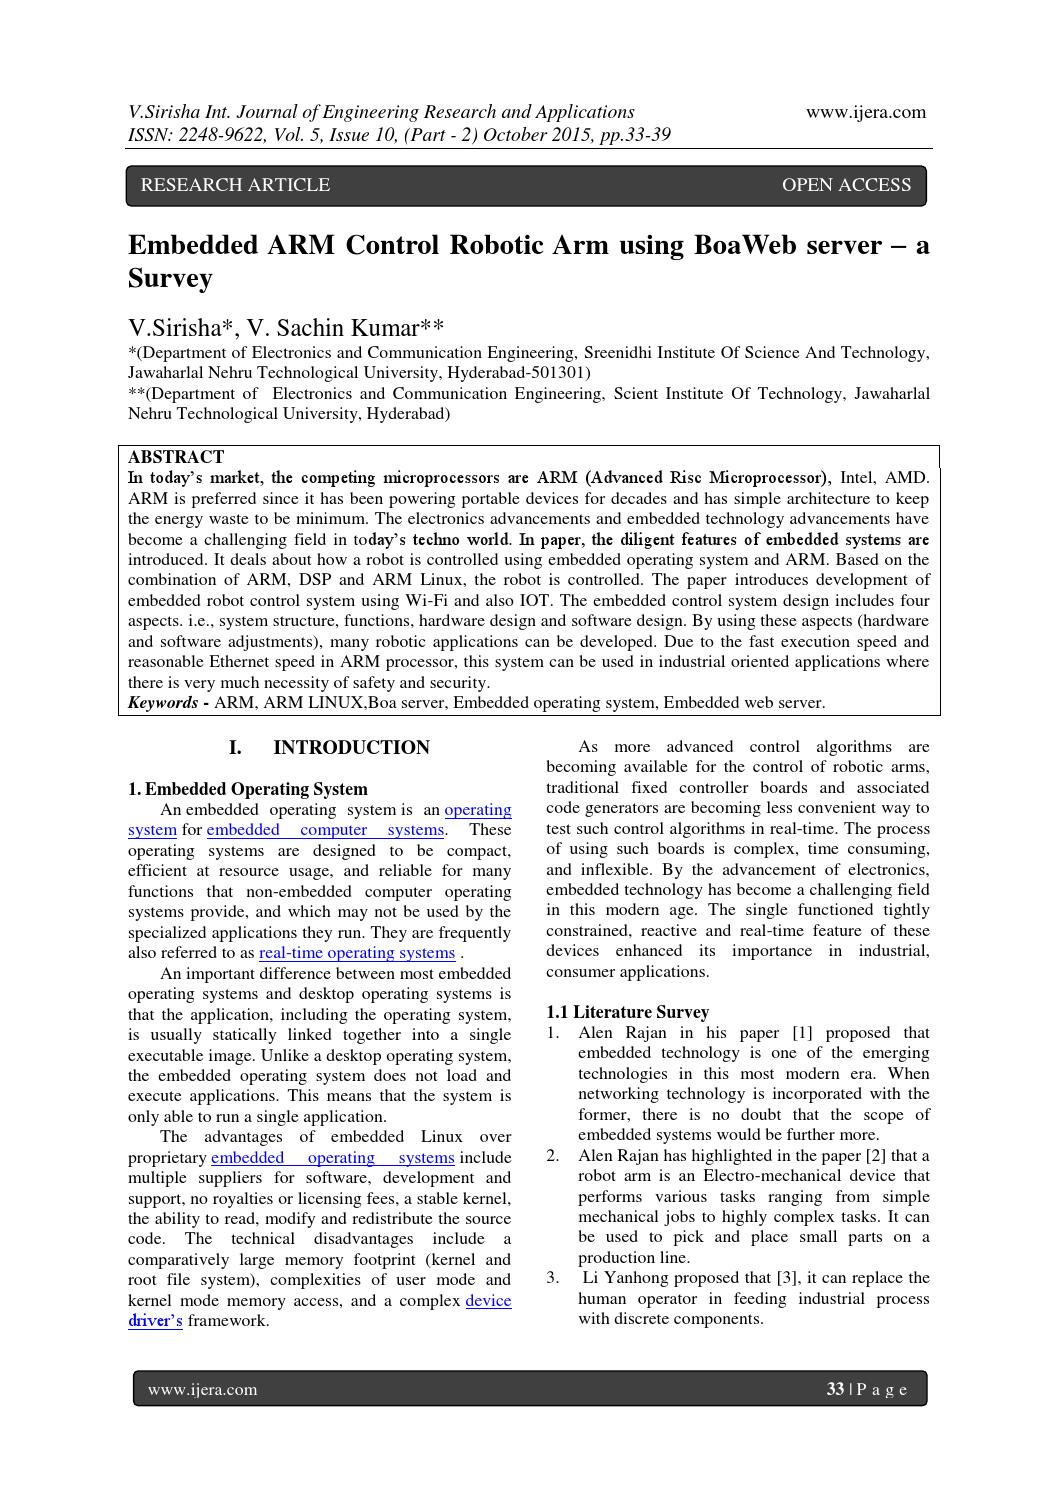 Embedded ARM Control Robotic Arm using BoaWeb server – a Survey by